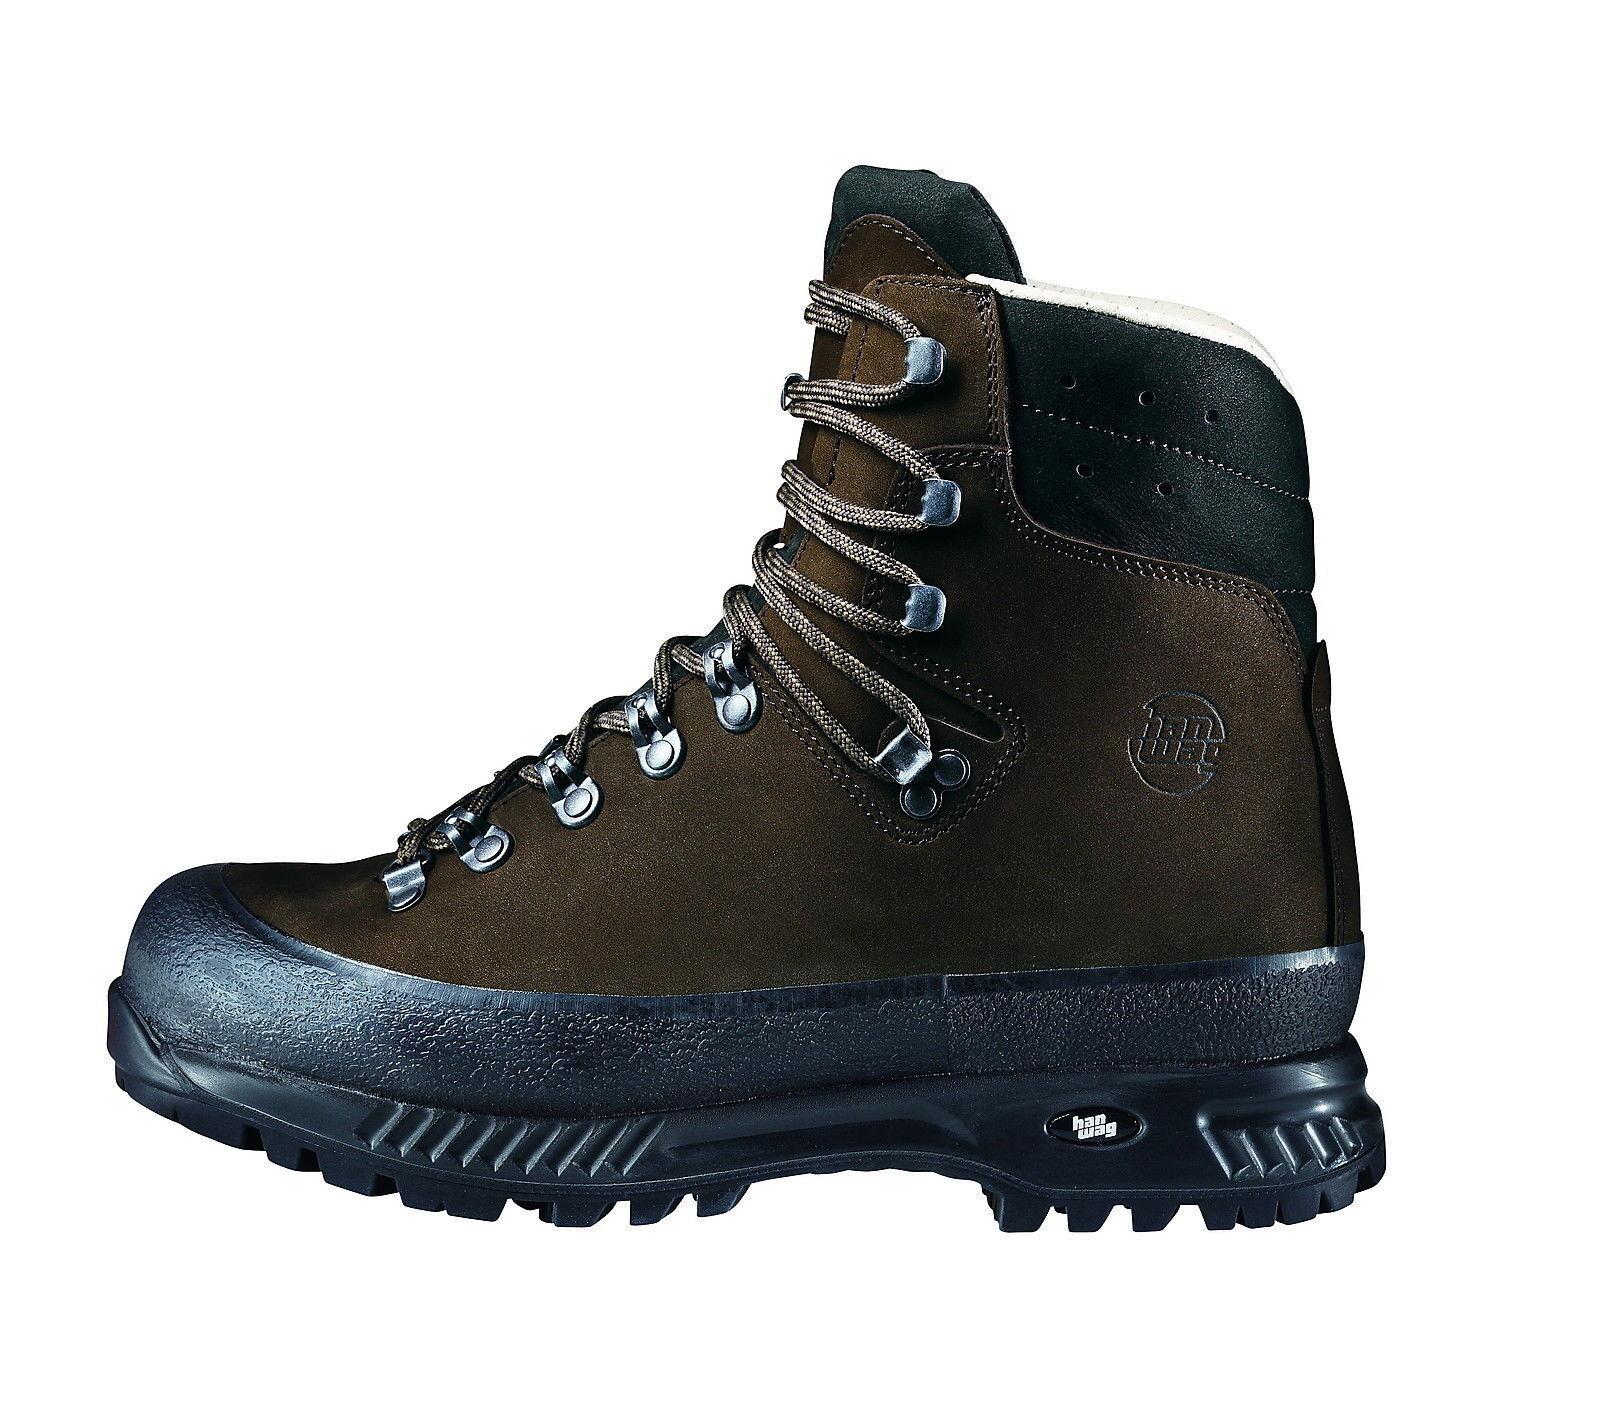 Hanwag Bergschuhe  Yukon Men Leder Größe 9 - 43 erde  | Kunde zuerst